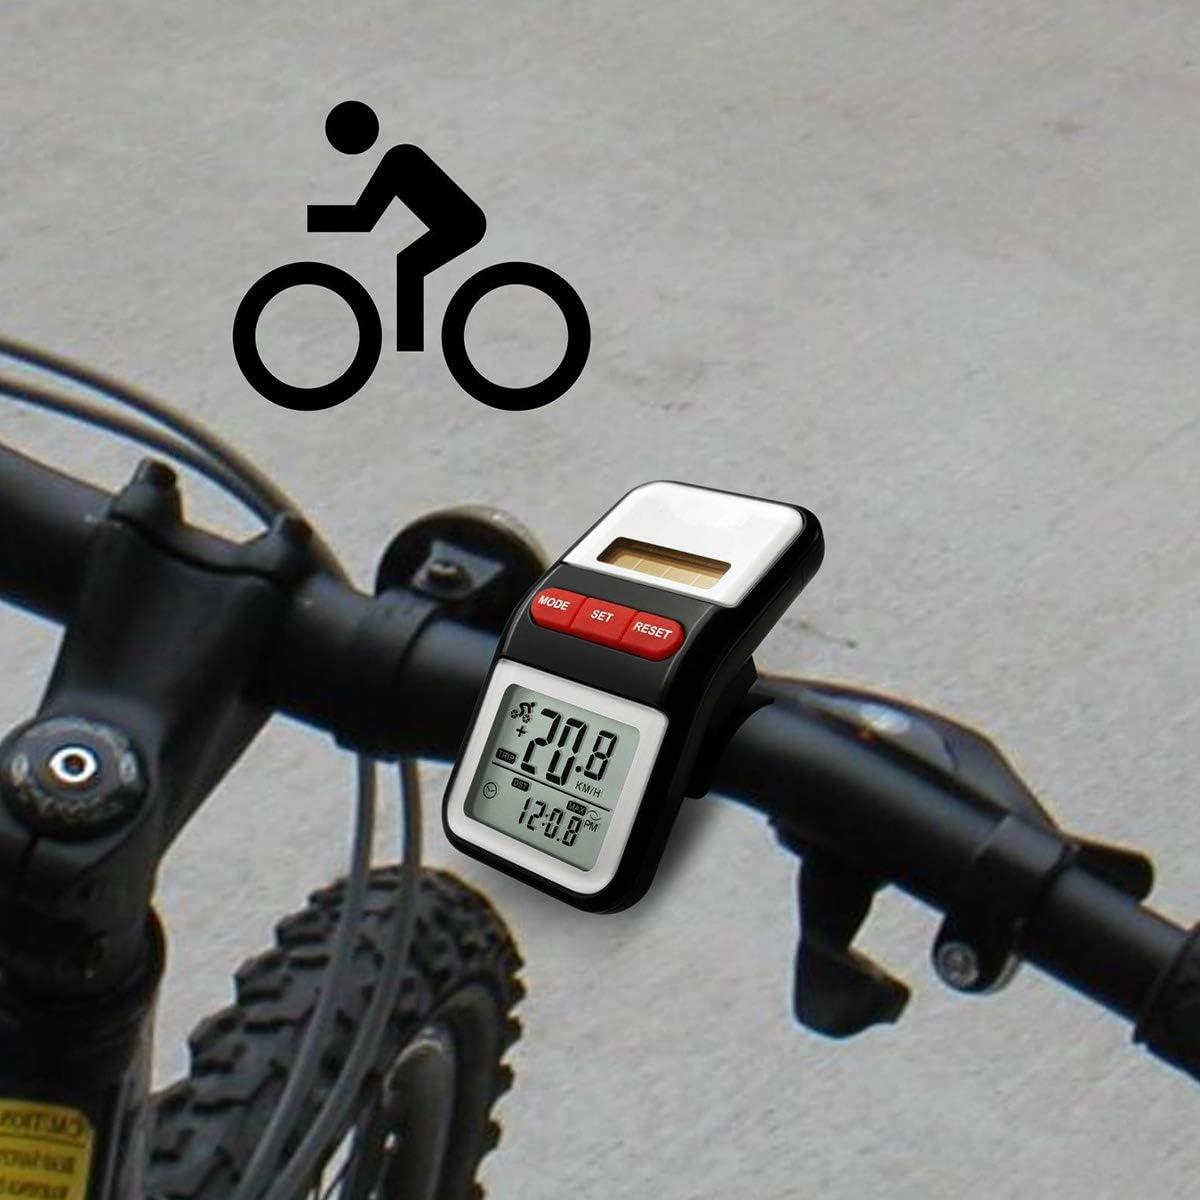 Plata, con bot/ón de bater/ía VORCOOL Veloc/ímetro de la Bicicleta a Prueba de Agua Multifuncional Bike Computer Wireless Cycling Odometer